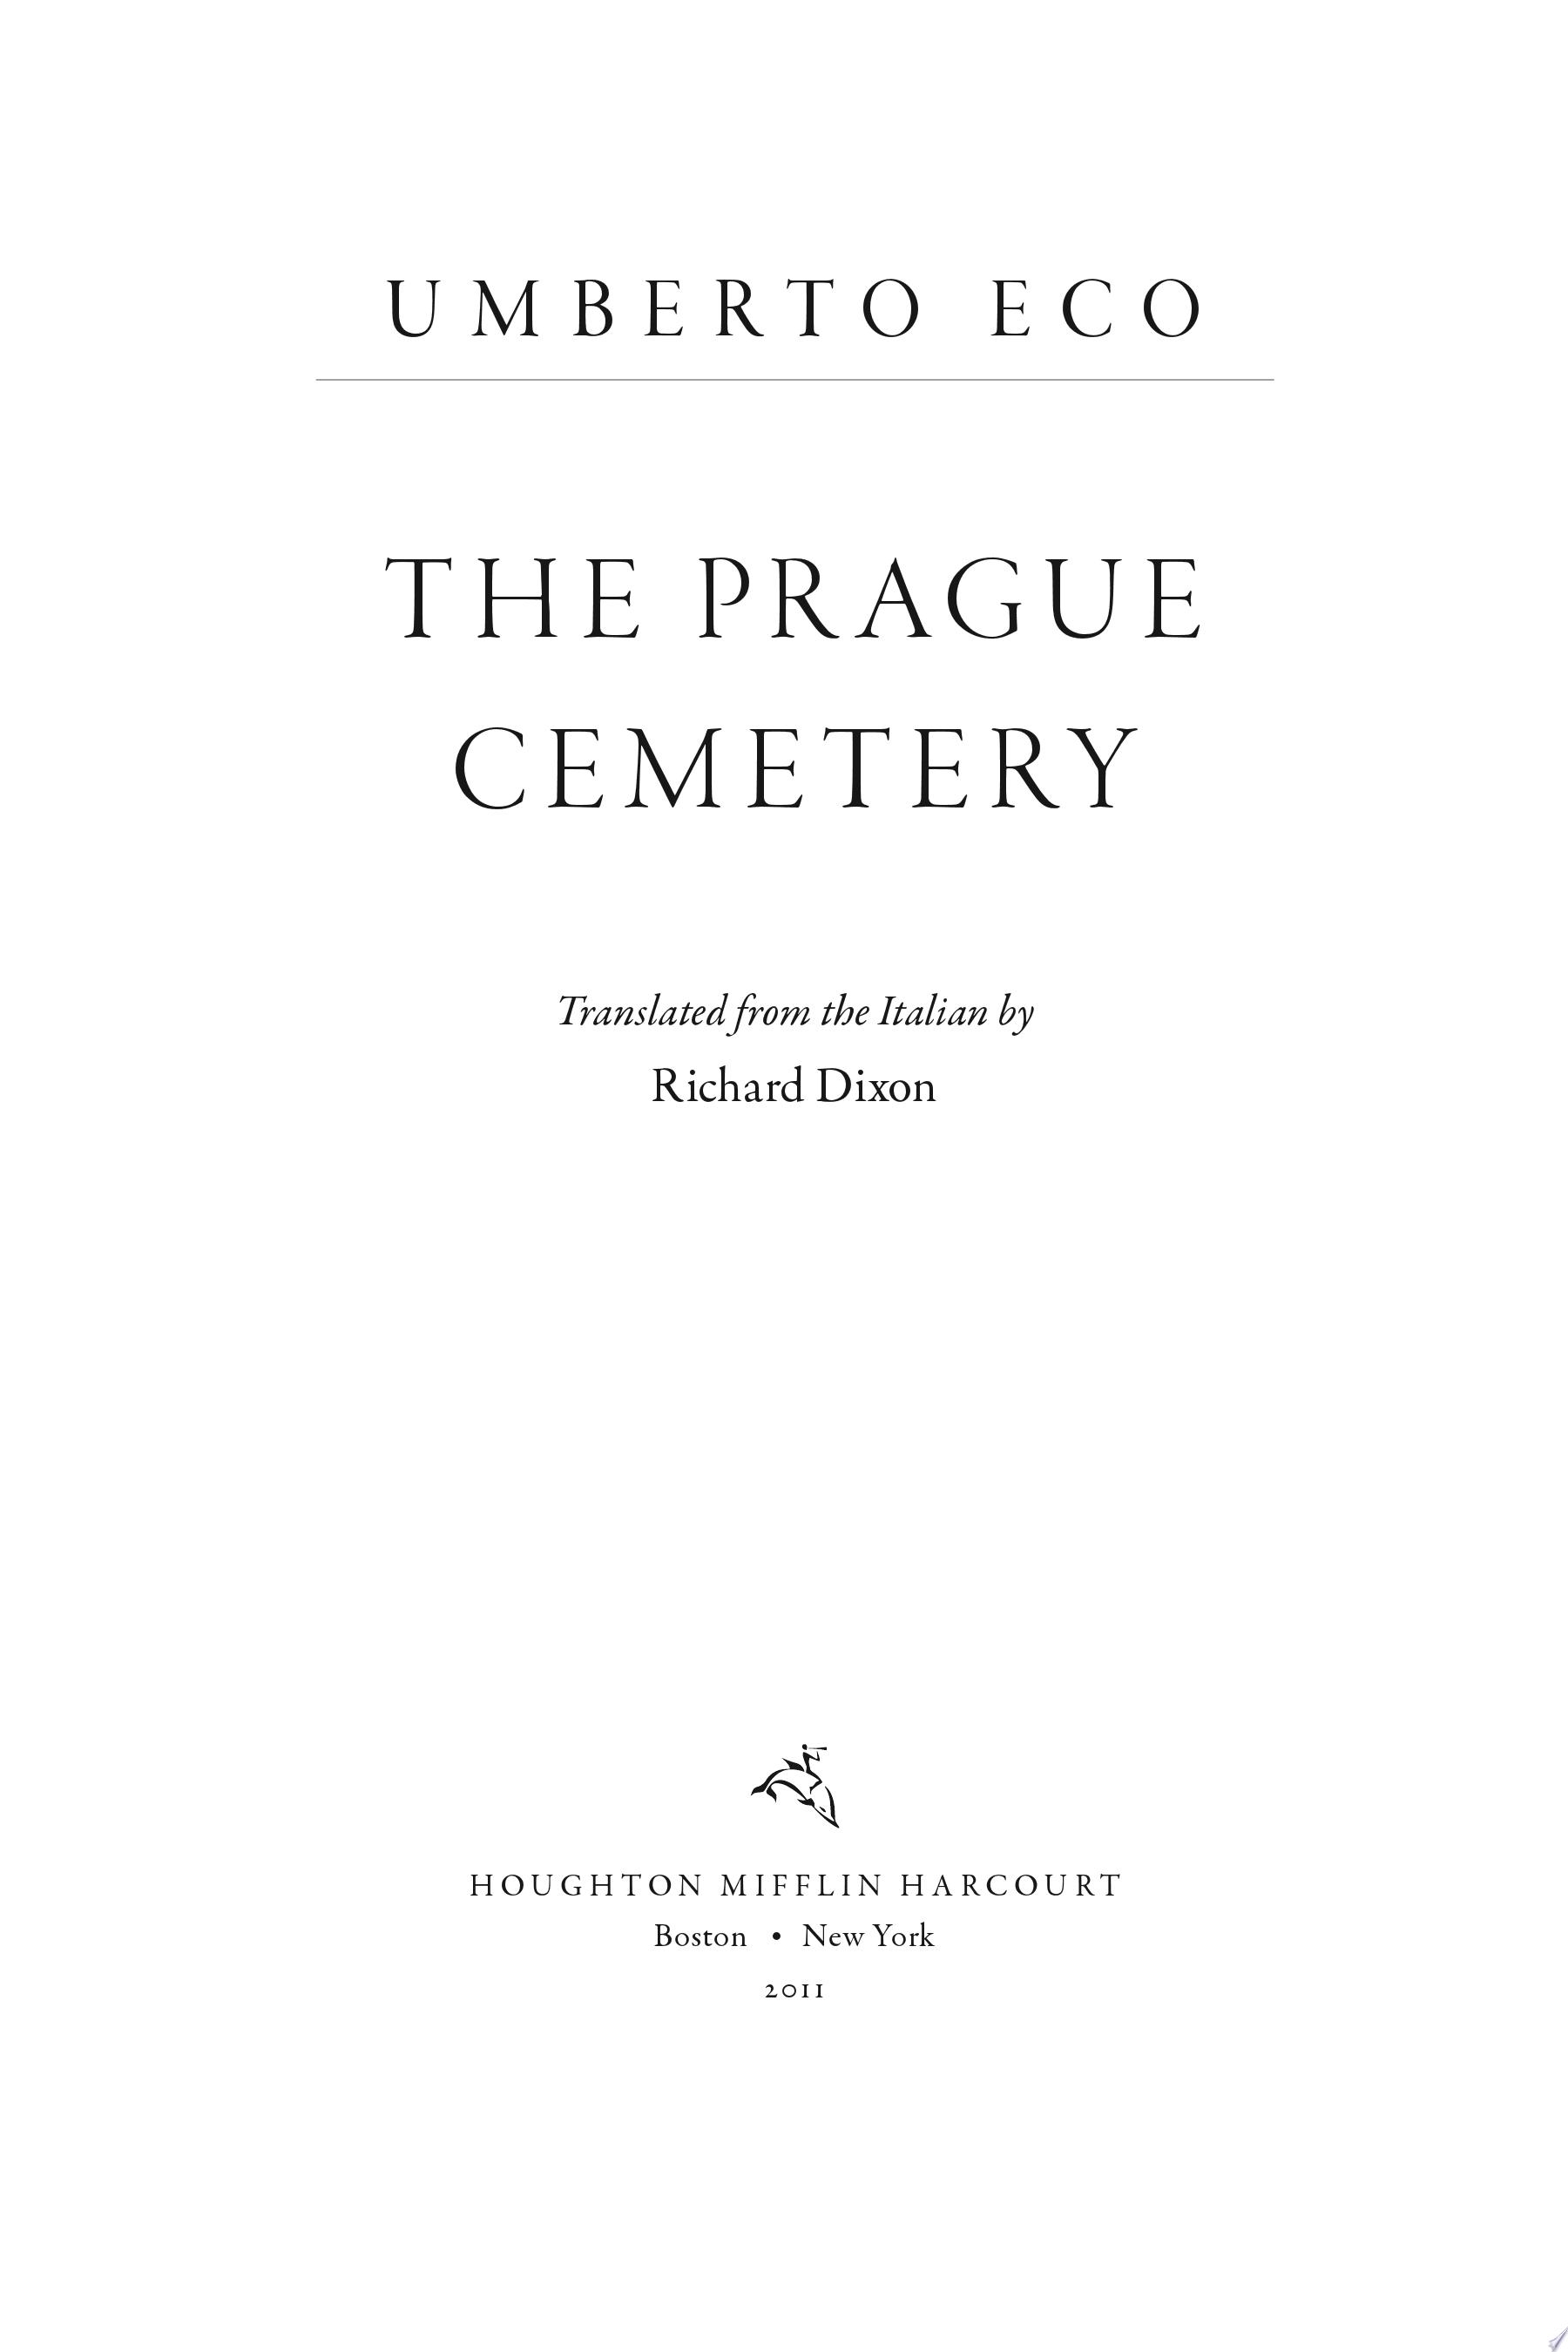 The Prague Cemetery